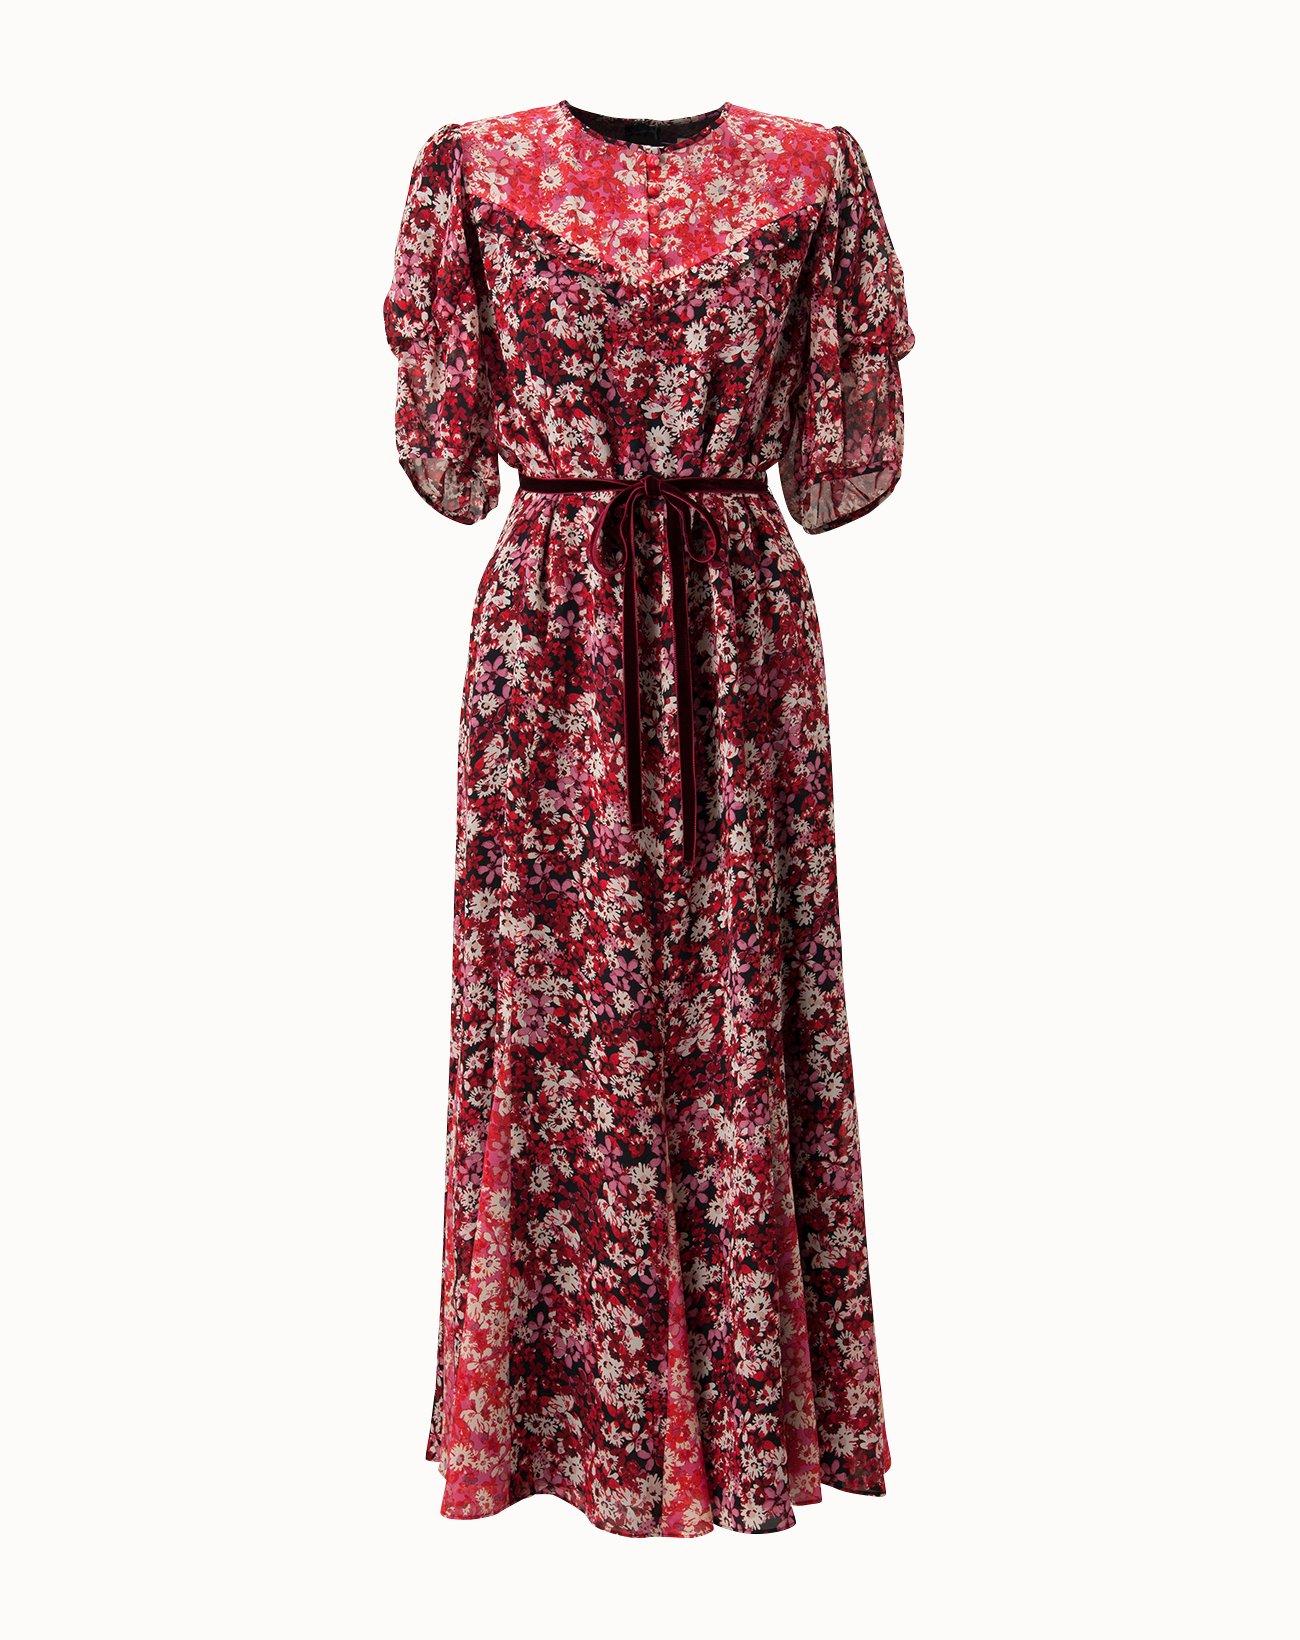 Palette Flower Dress - Red